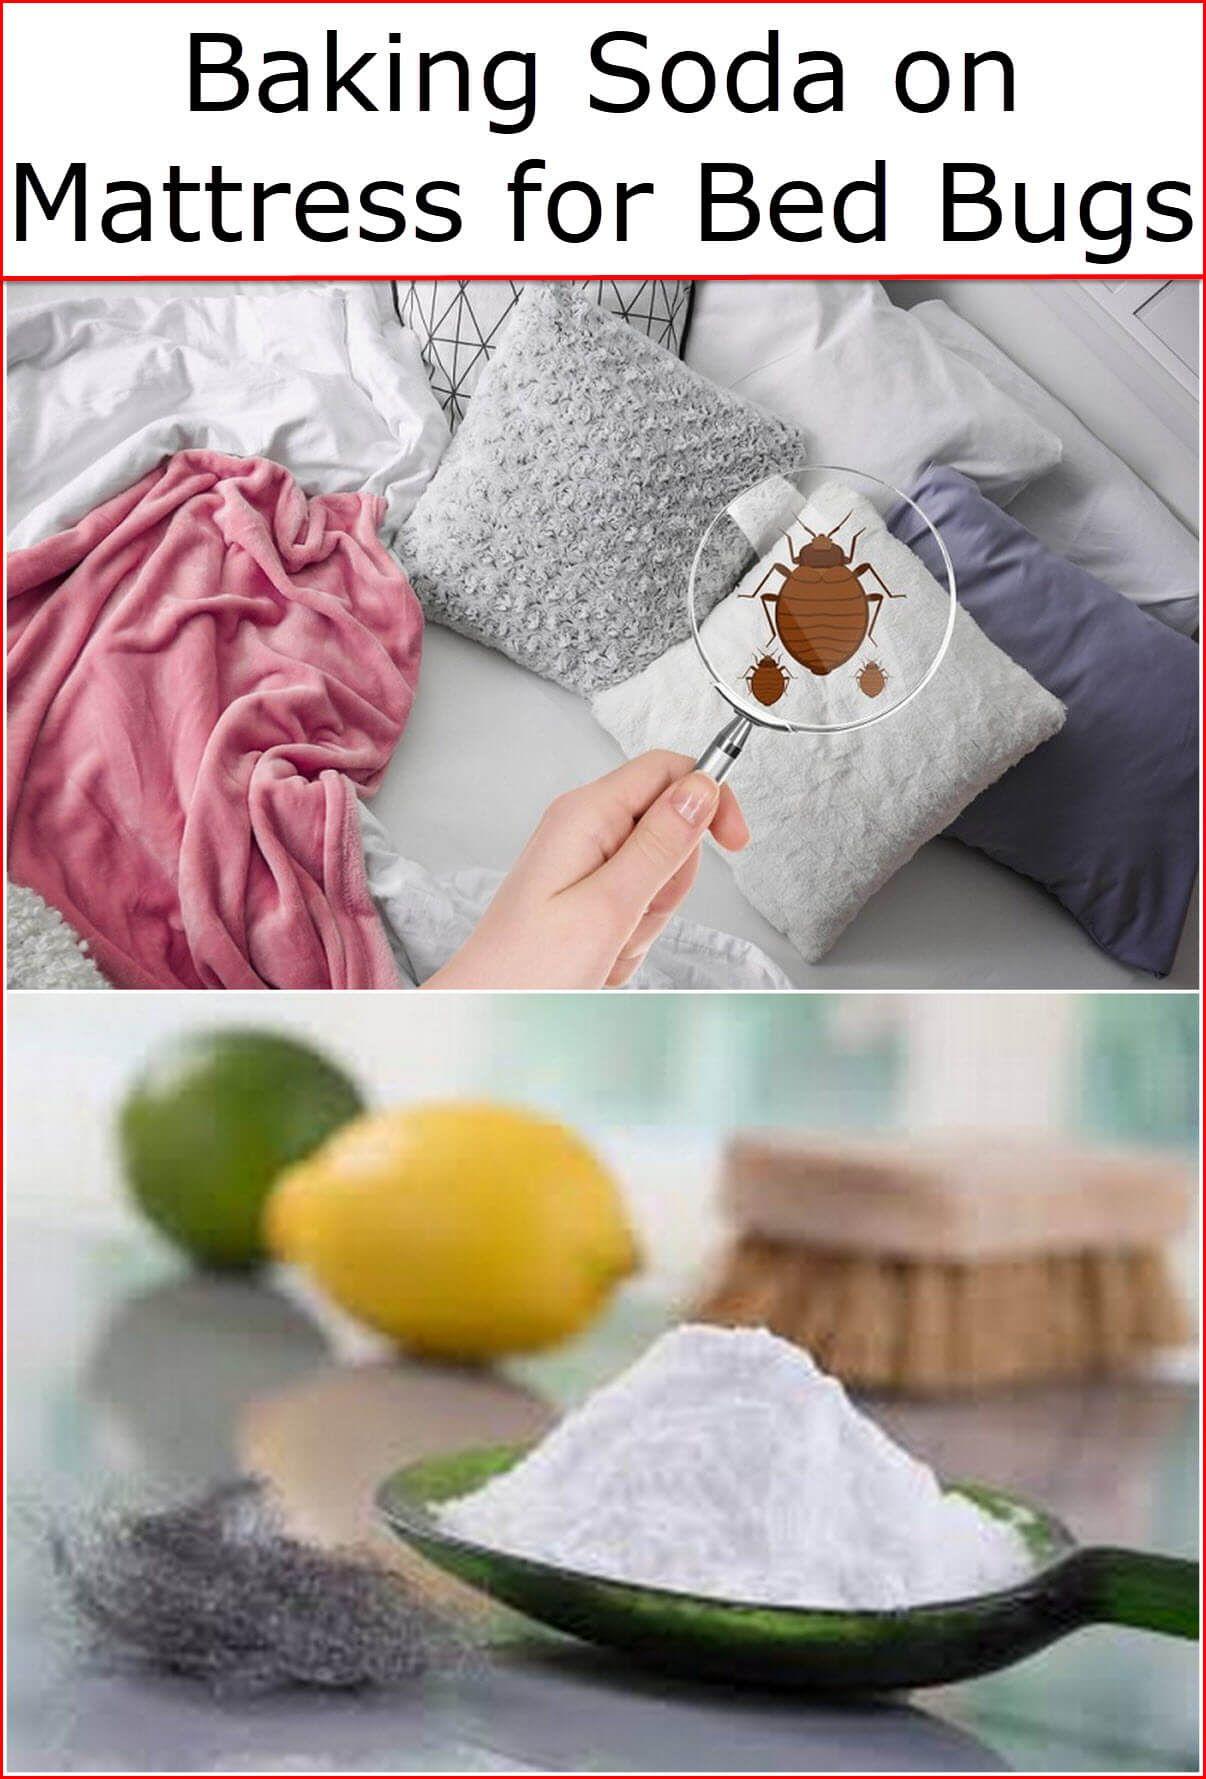 Baking Soda On Mattress For Bed Bugs Baking Soda On Mattress